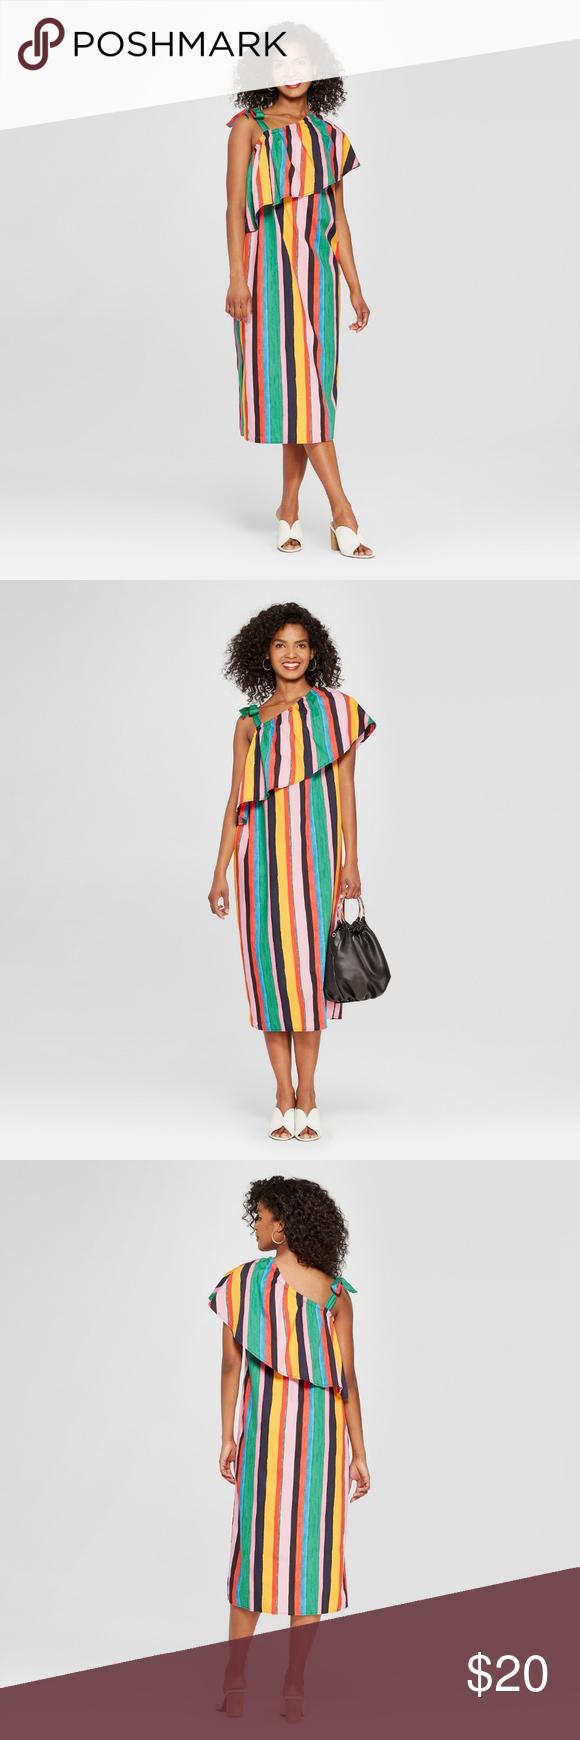 7435a4b80334 Colorful Ruffle Midi Dress - Who What Wear™ Women s Striped Off the Shoulder  Ruffle Midi